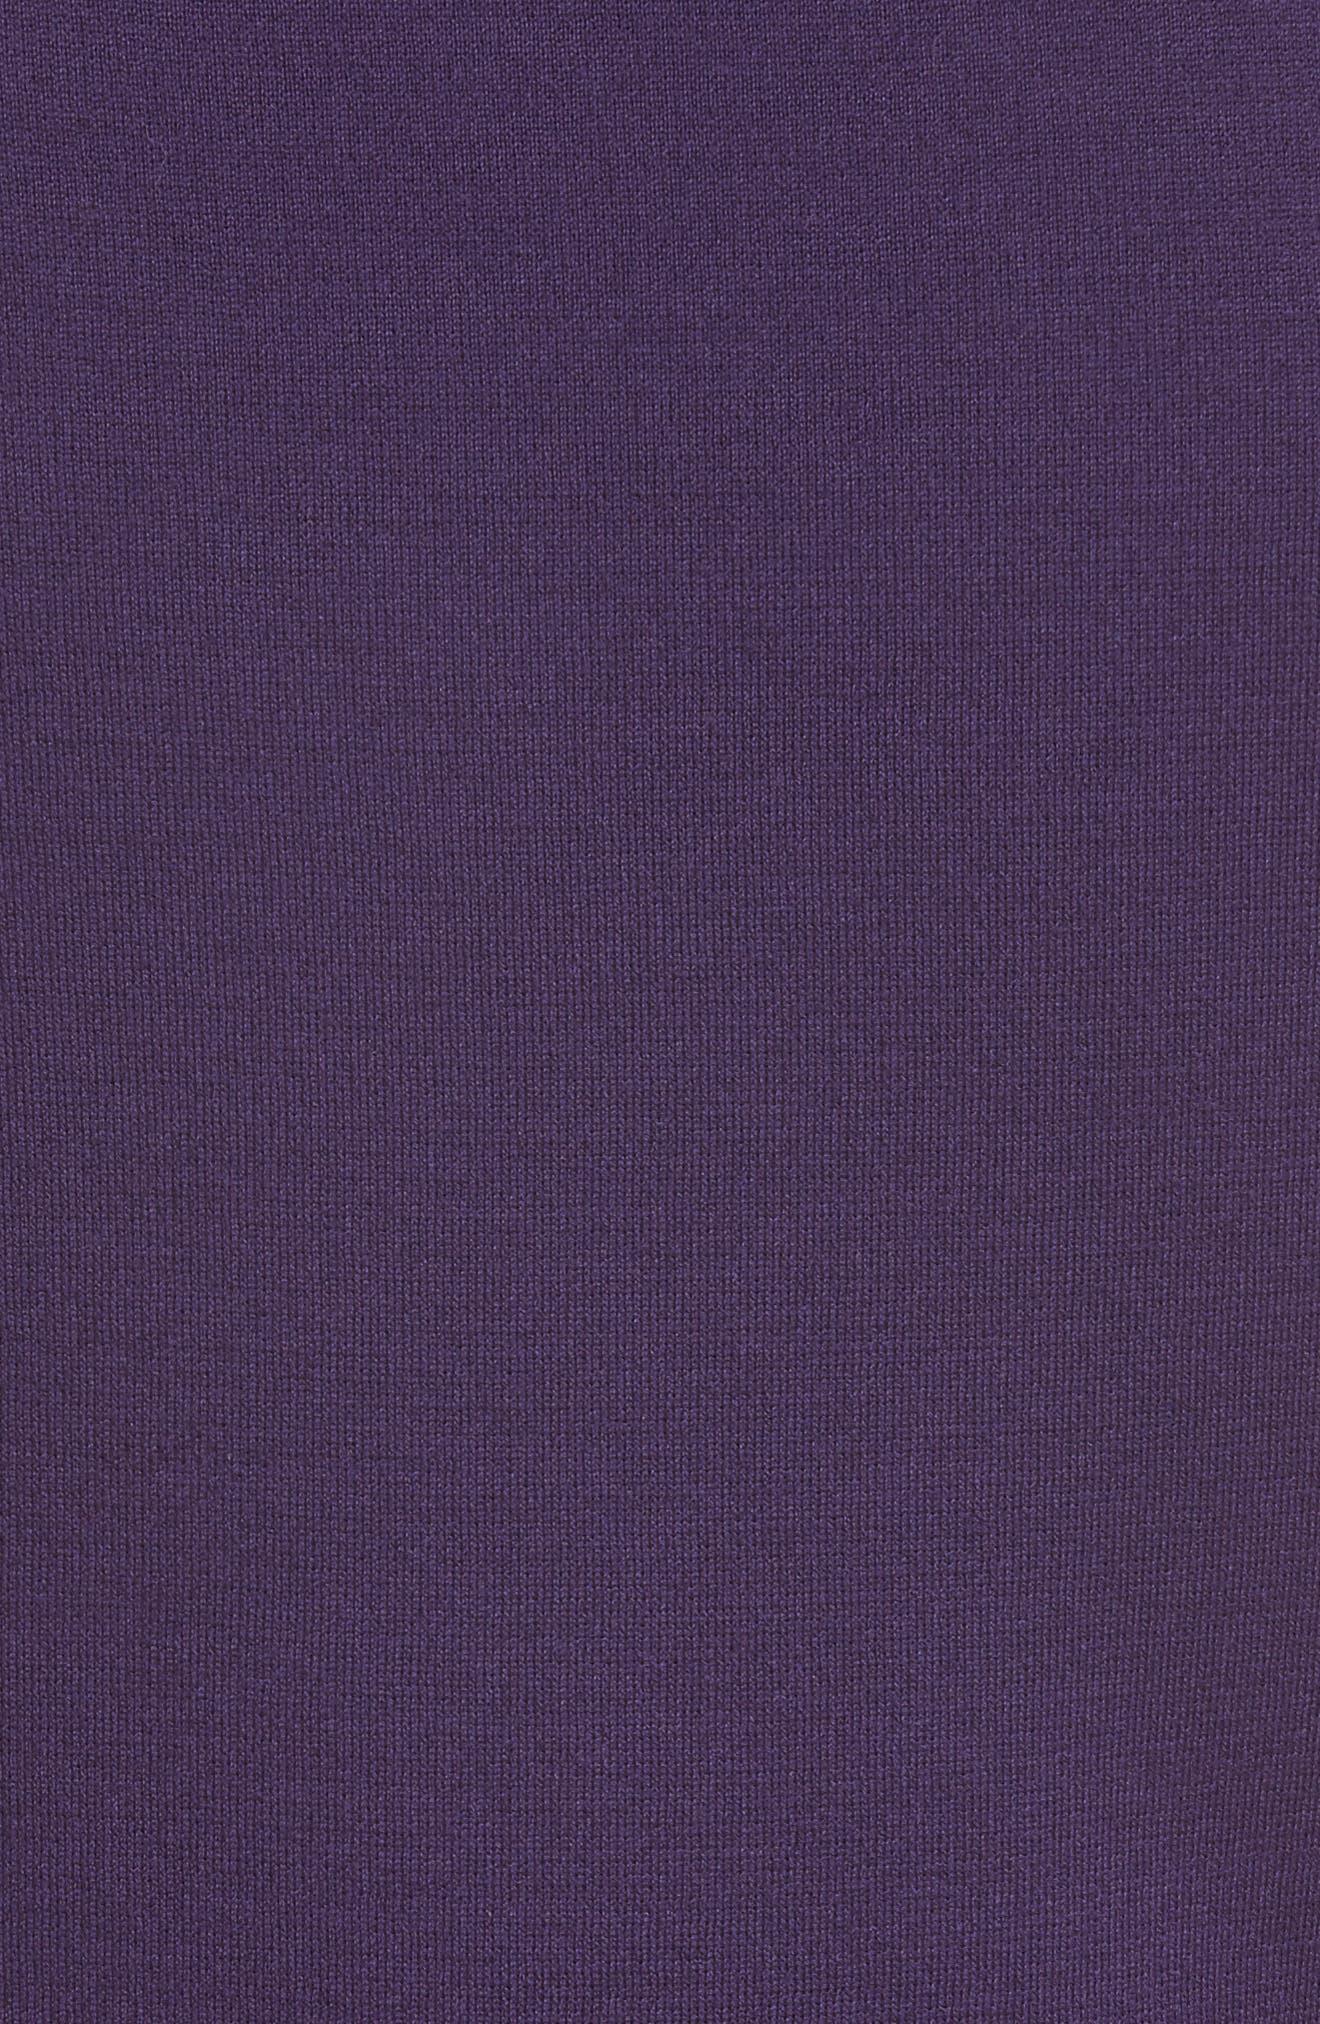 Milano Knit Contour Shell,                             Alternate thumbnail 5, color,                             Royal Amethyst